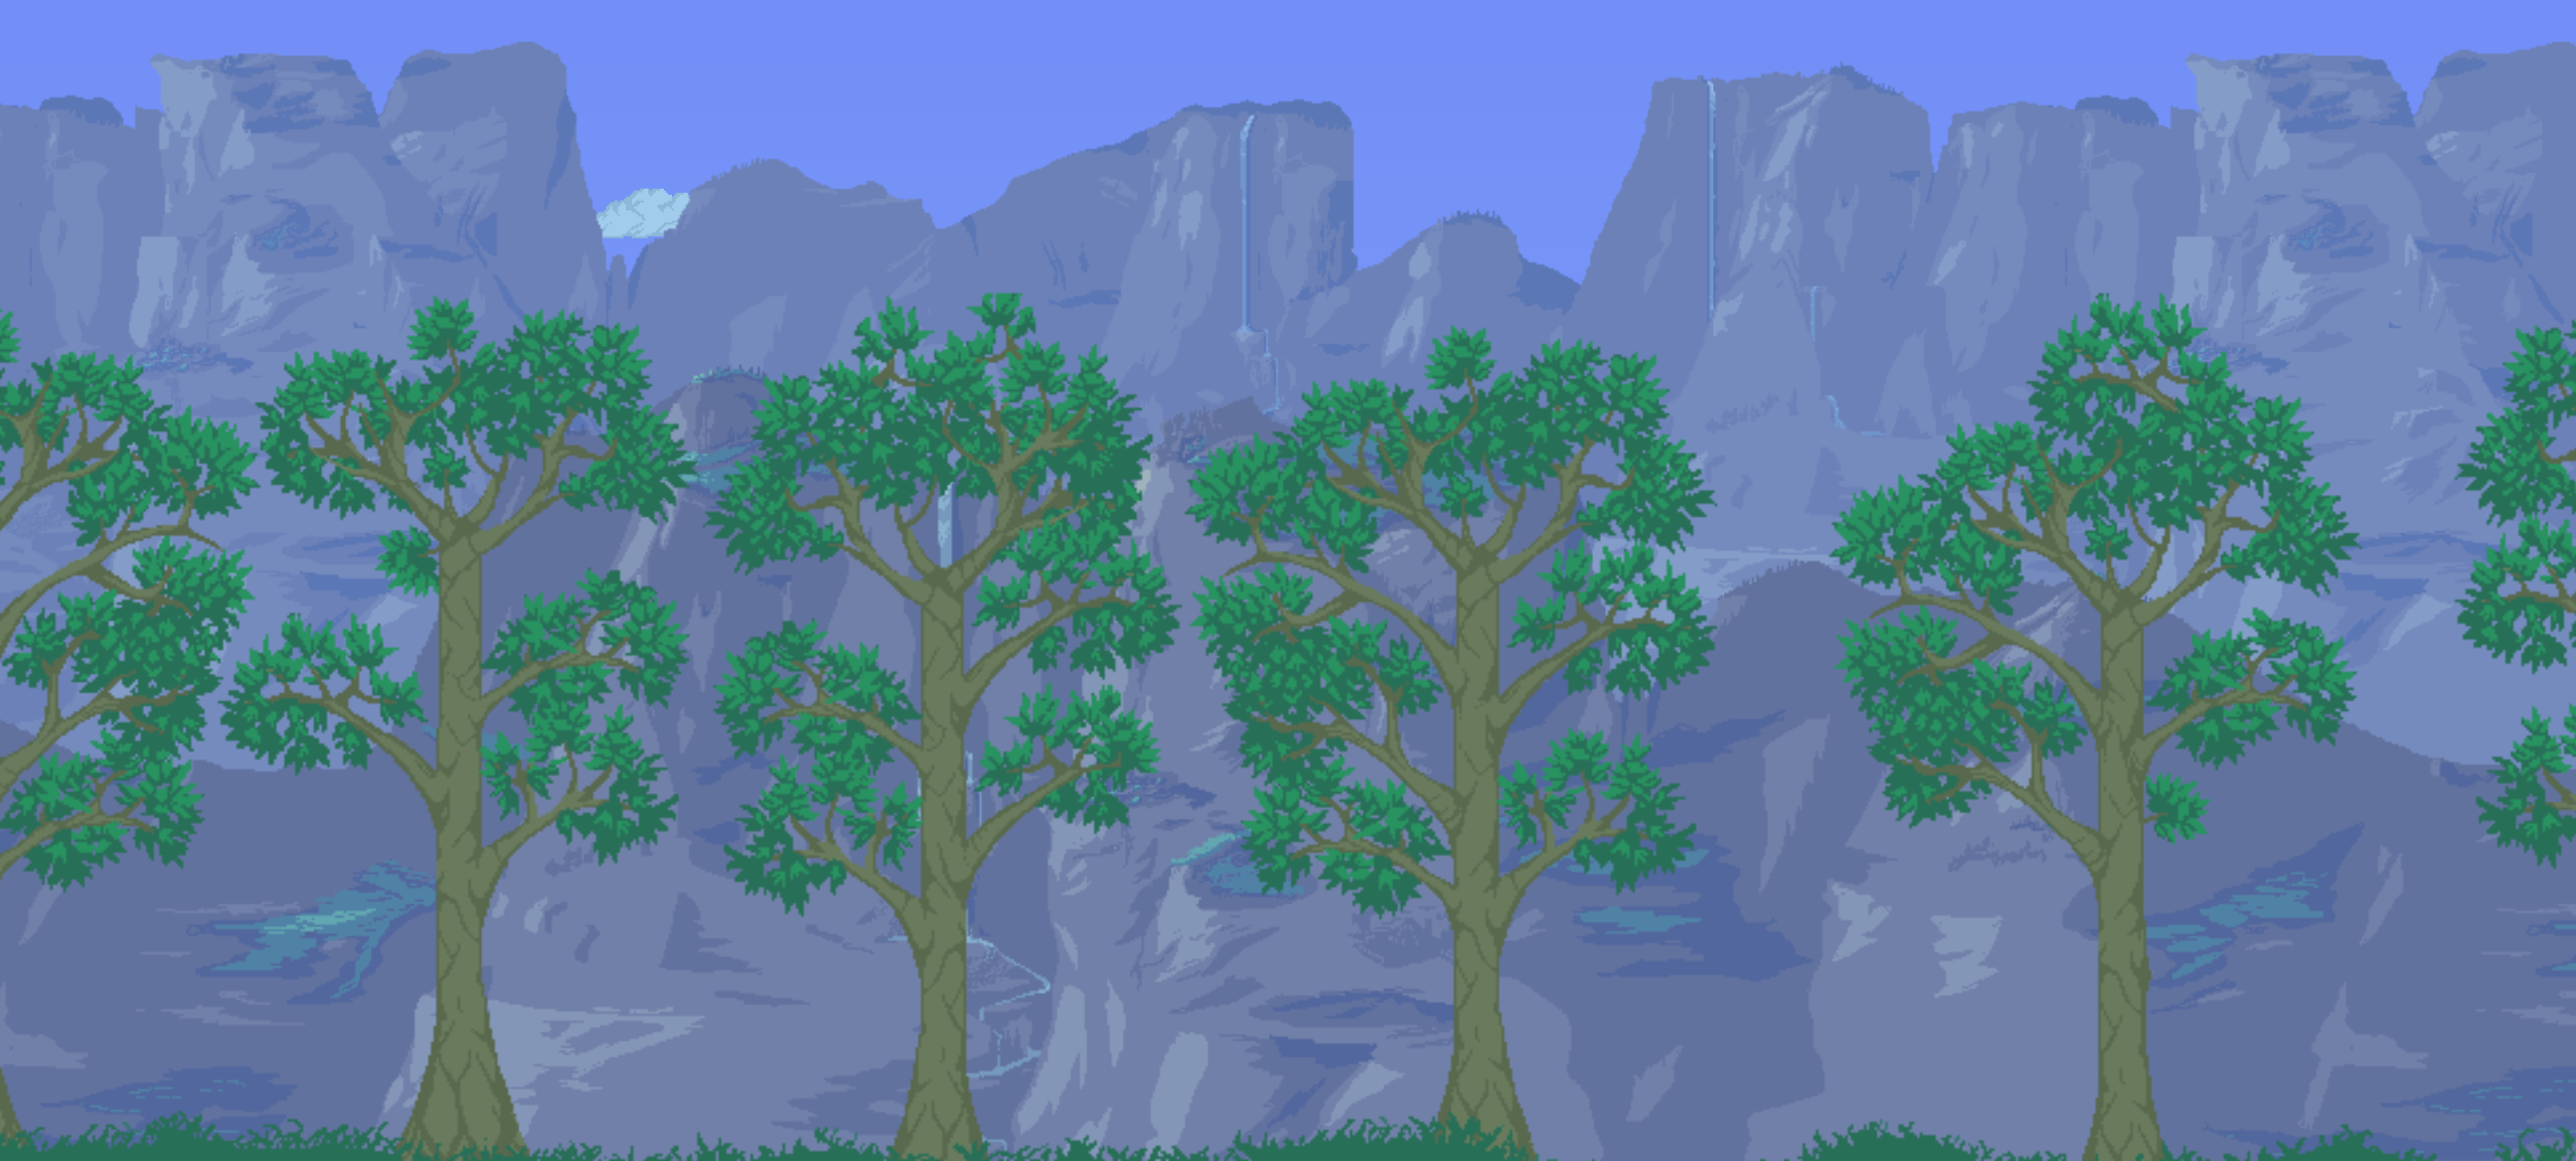 ... pixel backgrounds tumblr on 16 by DeviantArt dragon bit B forest  Snoodle ...